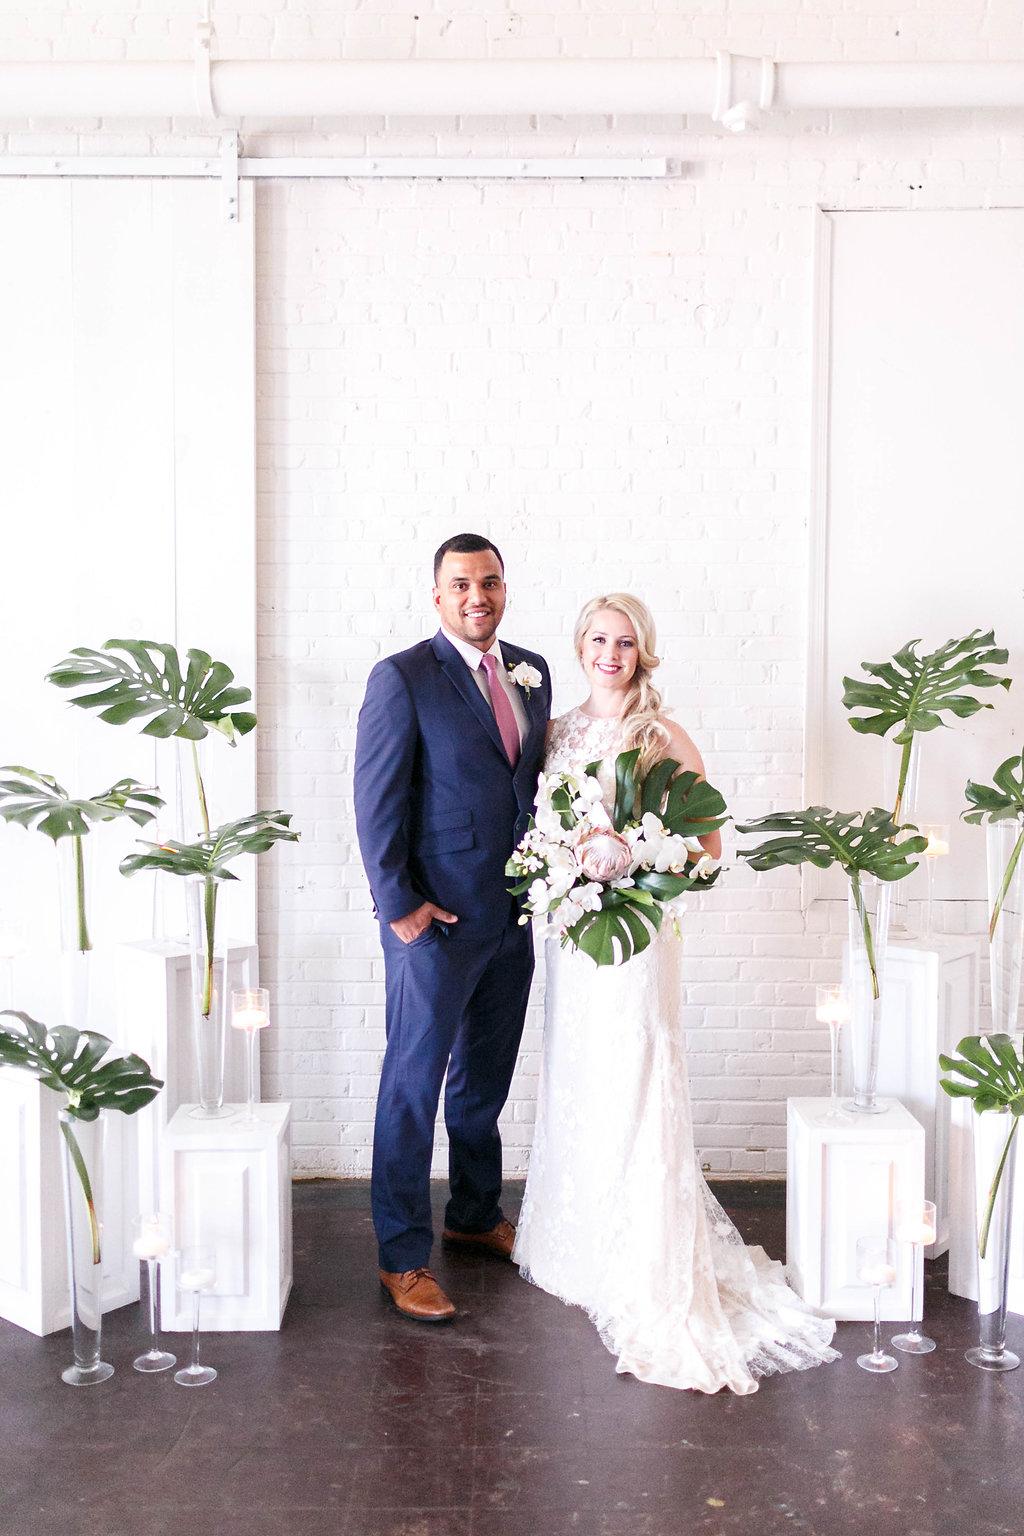 tropical wedding ideas - photo by Virginia Ashley Photography http://ruffledblog.com/modern-industrial-wedding-inspiration-with-tropical-vibes